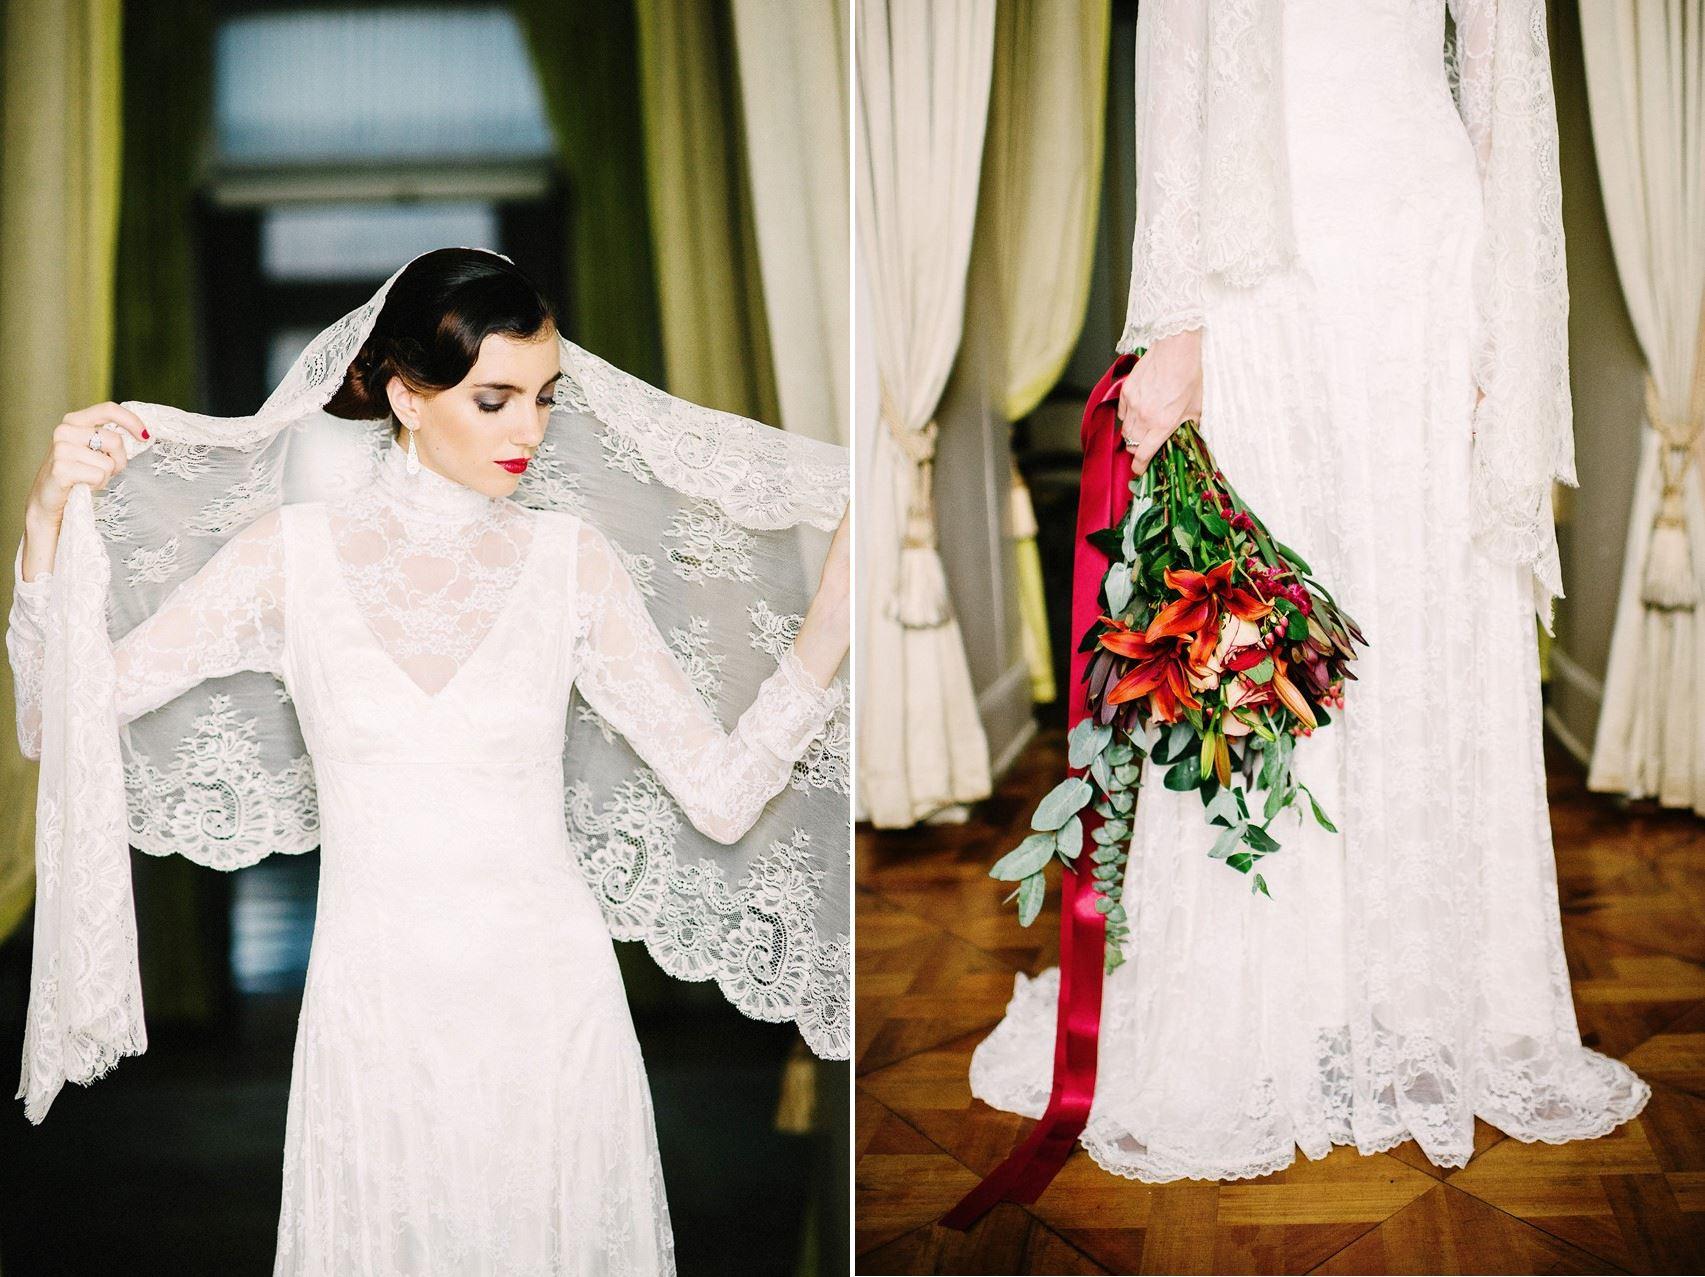 Long Sleeve Lace Wedding Dress - Wedding Inspiration with Latin American Elegance